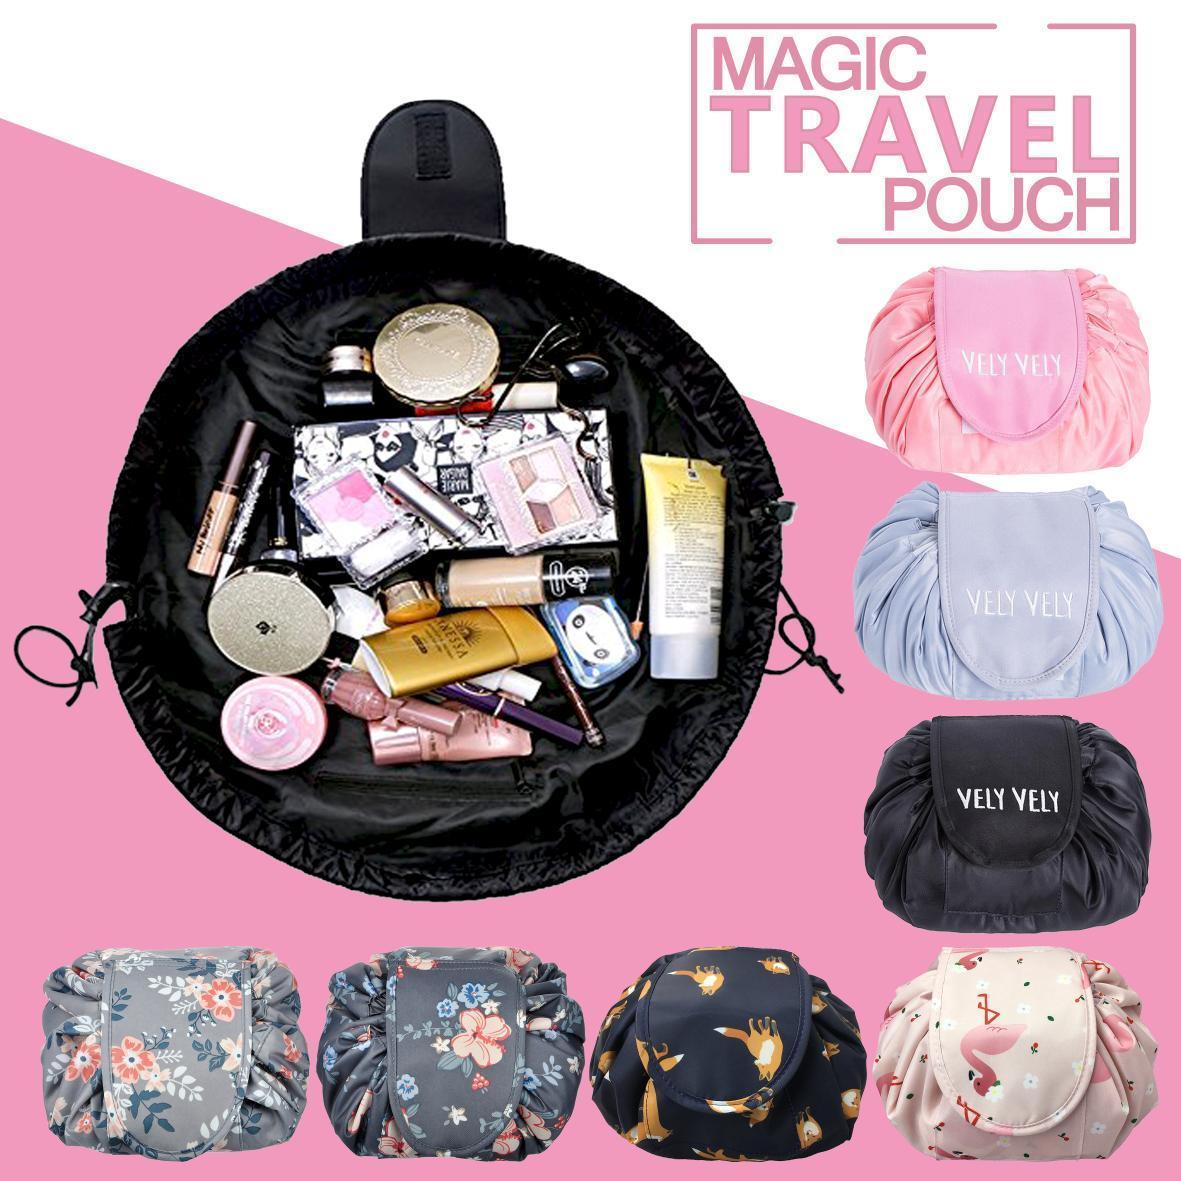 Fashion Portable Magic Travel Pouch Cosmetic Drawstring Bag Makeup Storage Bags